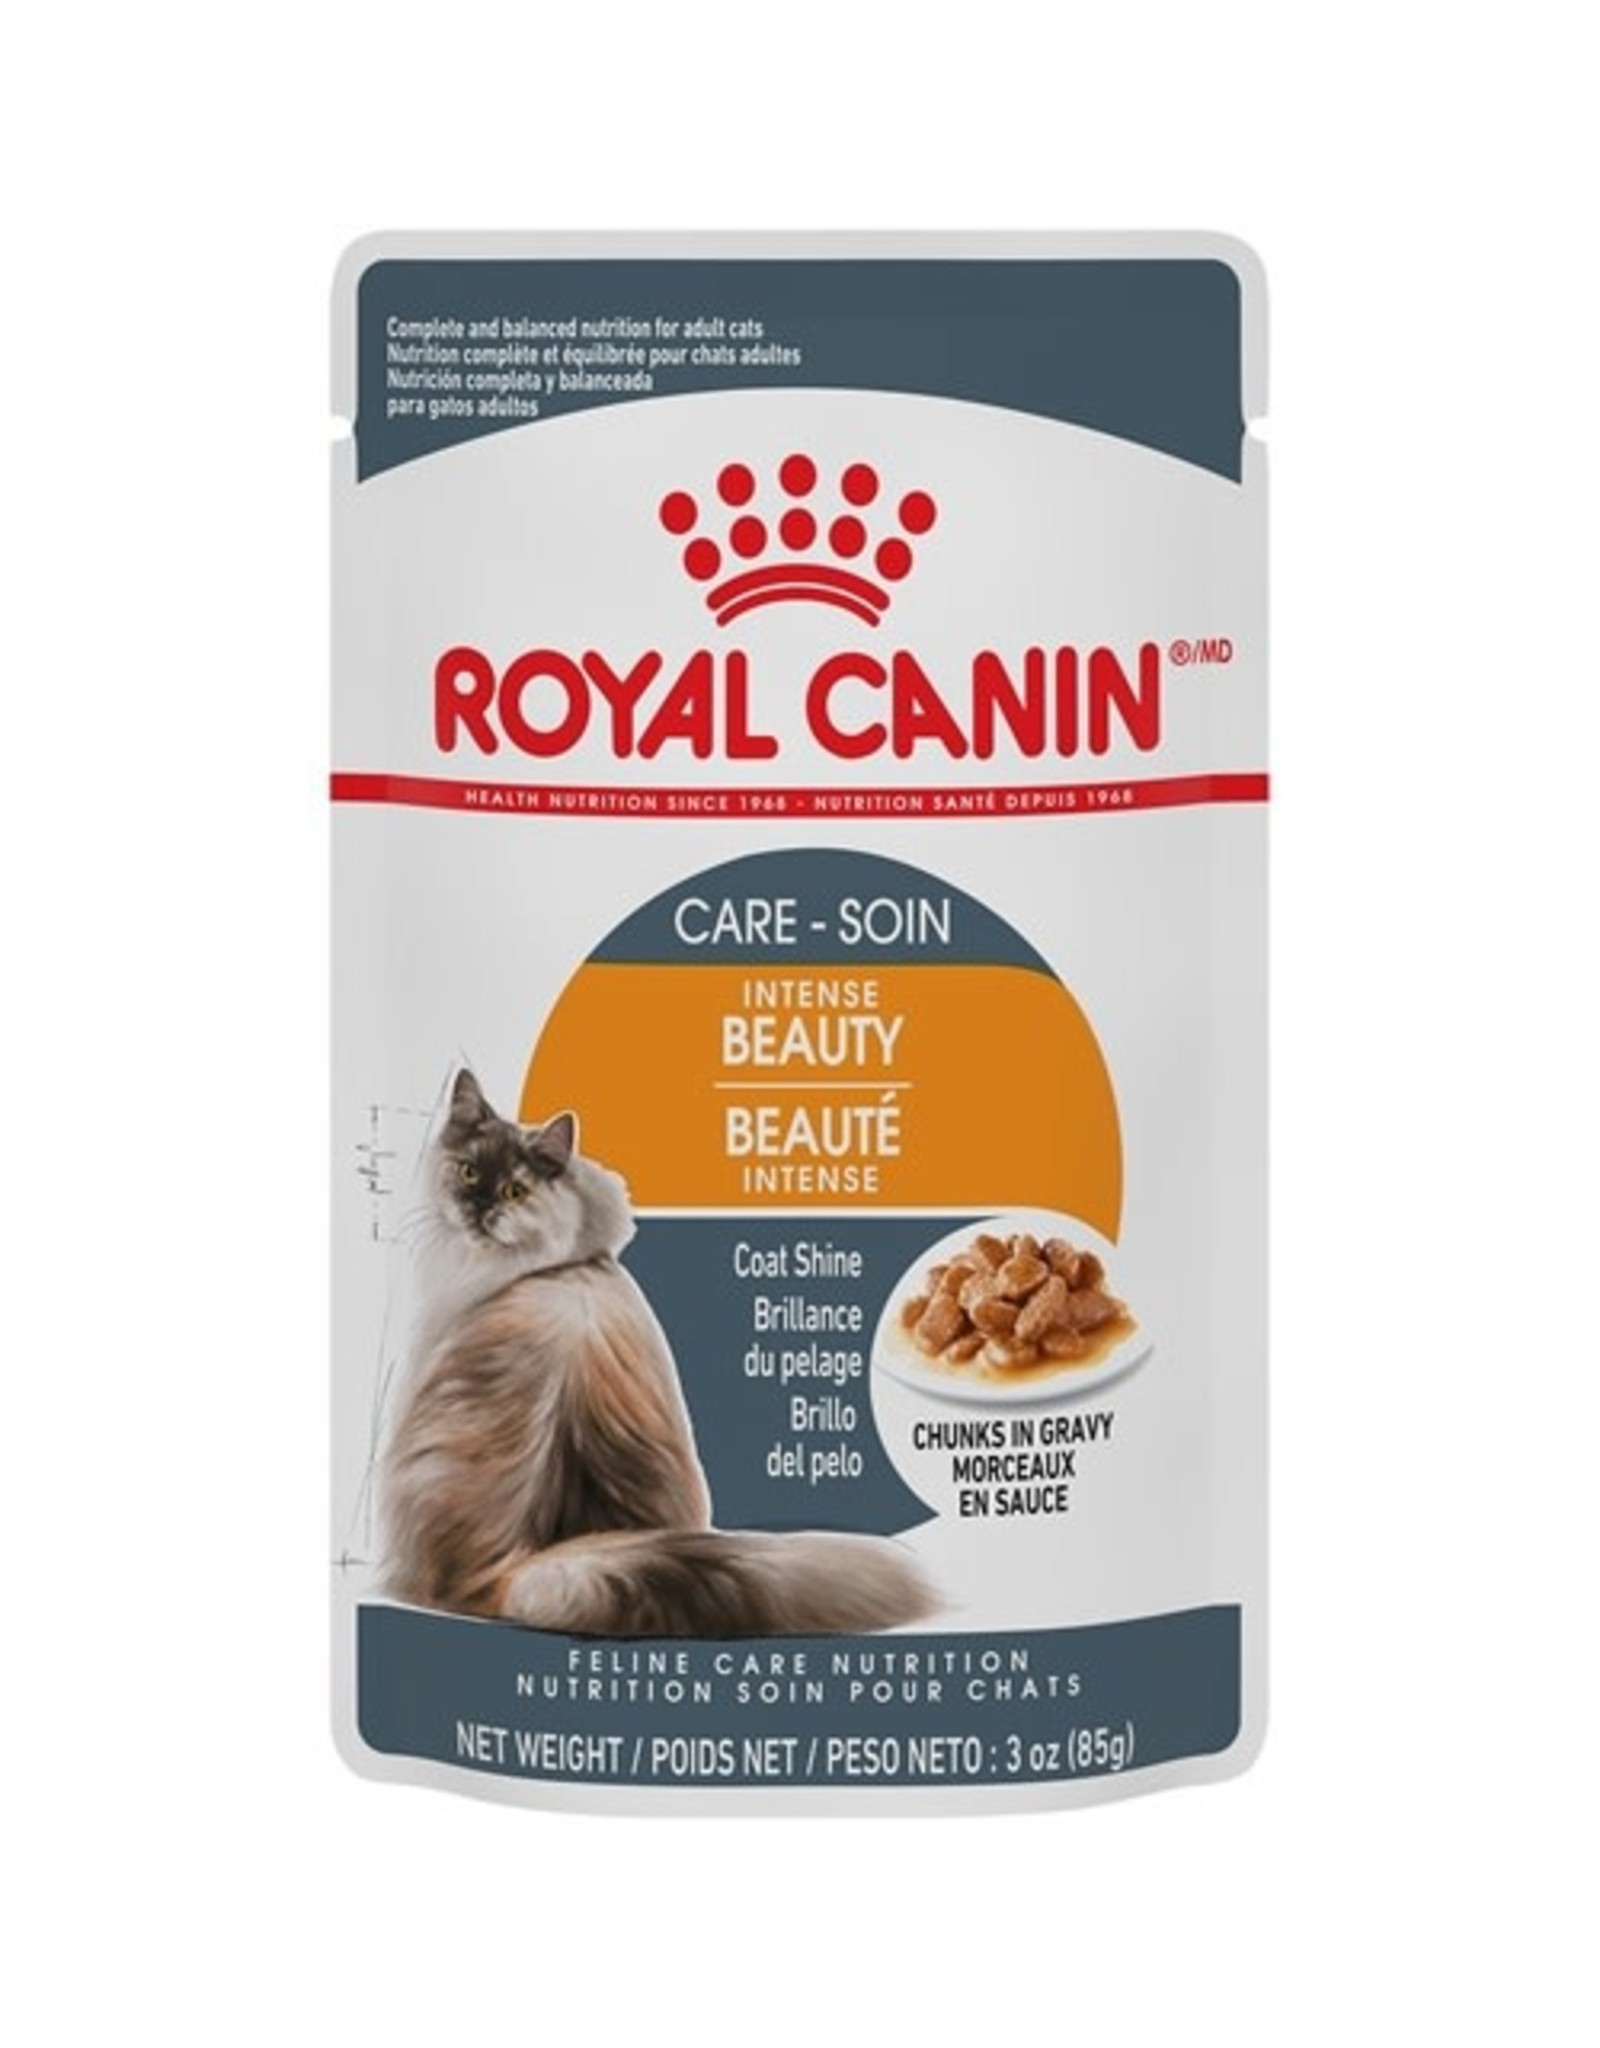 Royal Canin Royal Canin Intense Beauty Pouch 85g